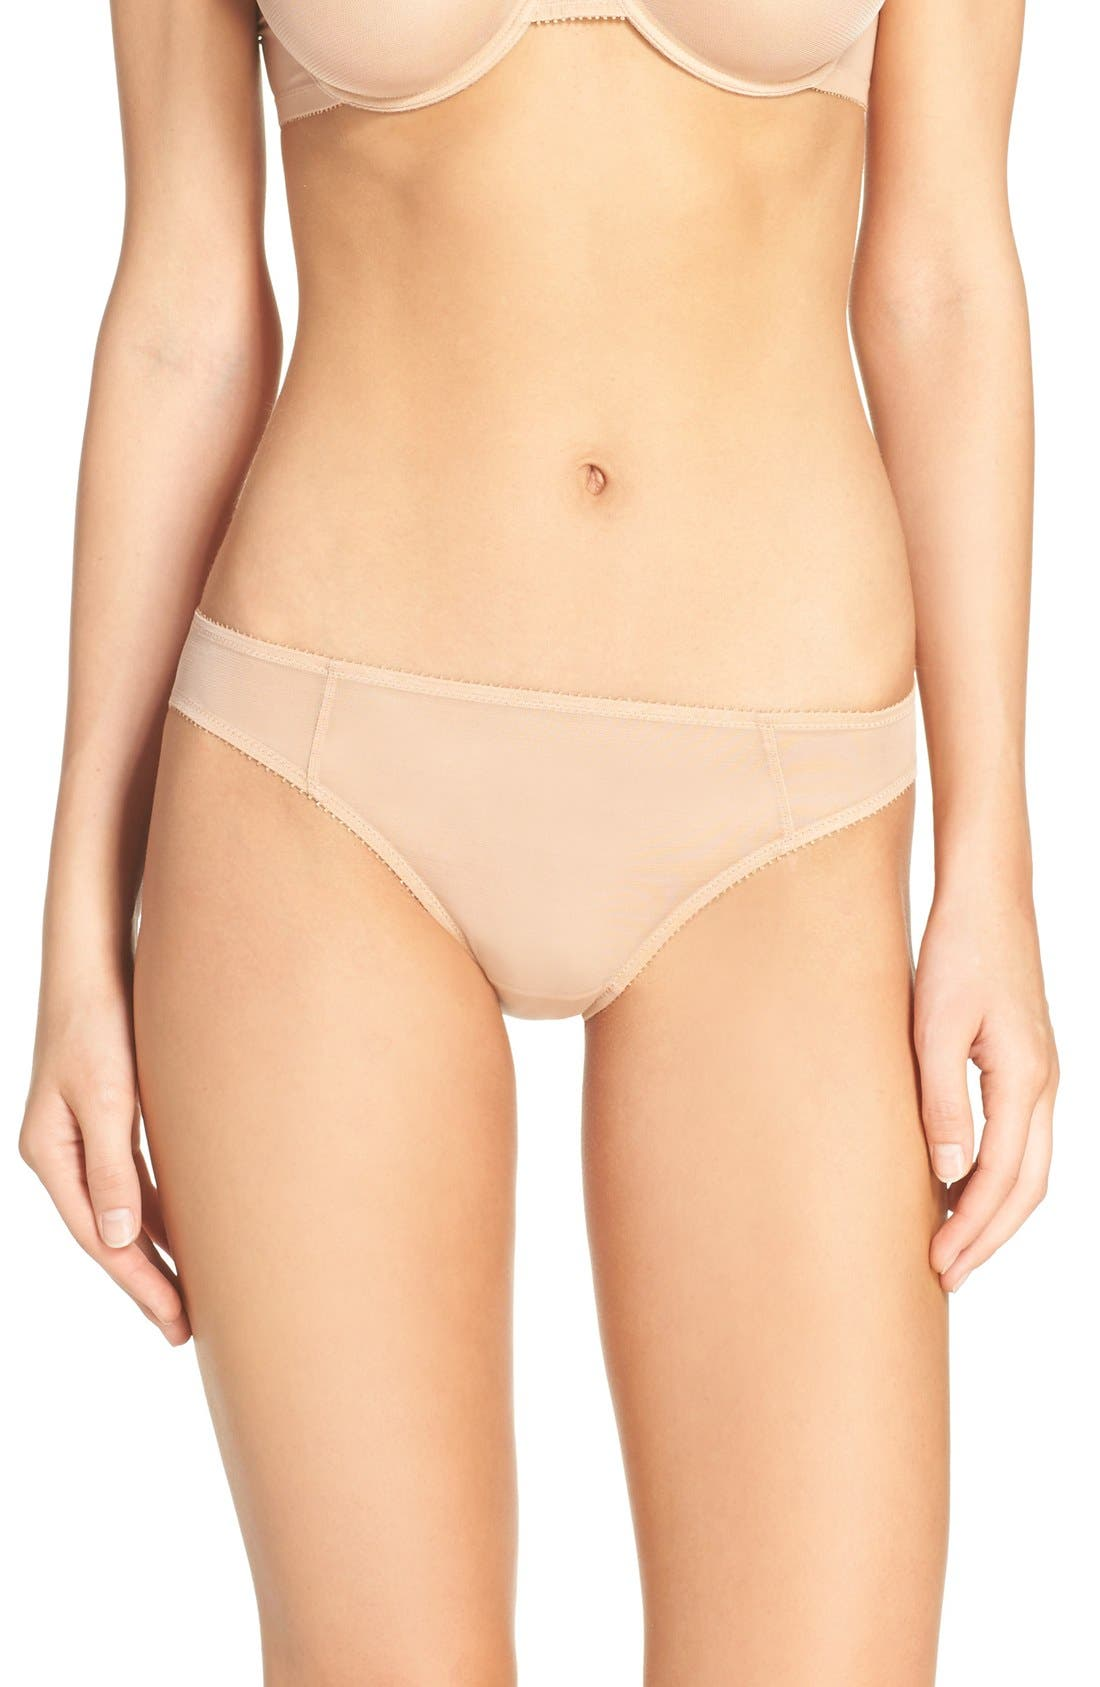 Main Image - Epure by Lise Charmel Revelation Beaute Bikini